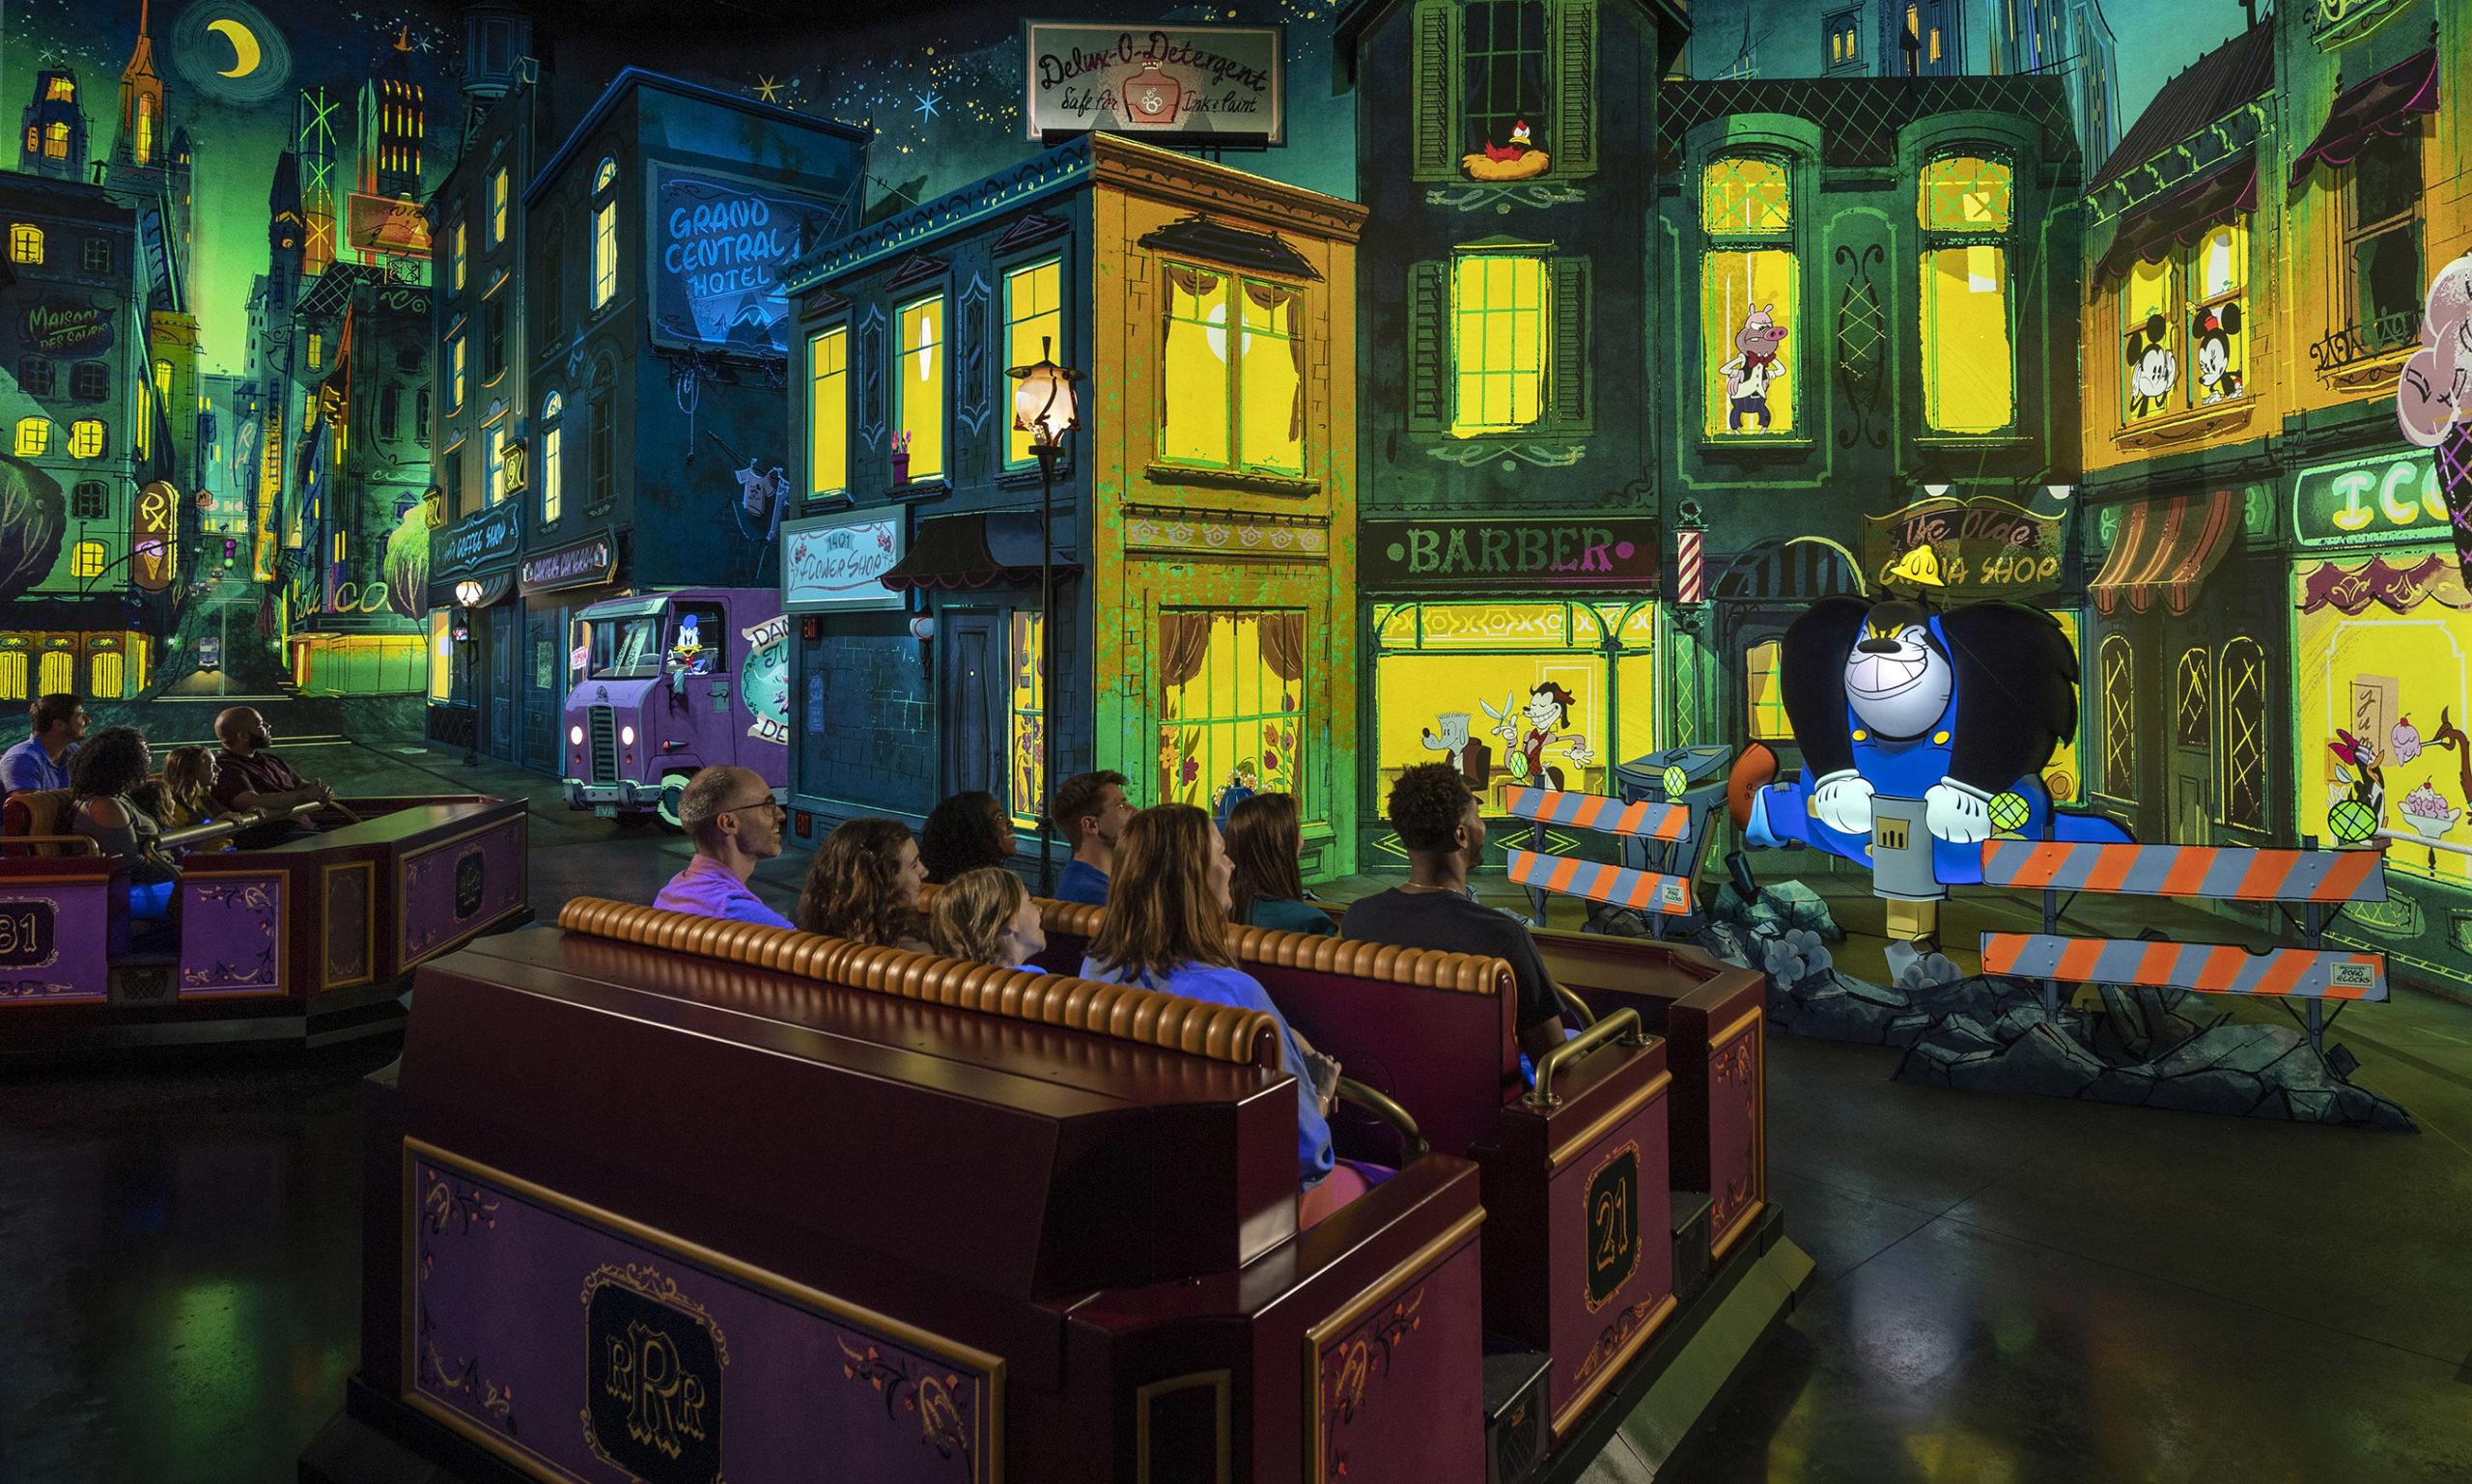 Inside Mickey and Minnie's Runaway Railway